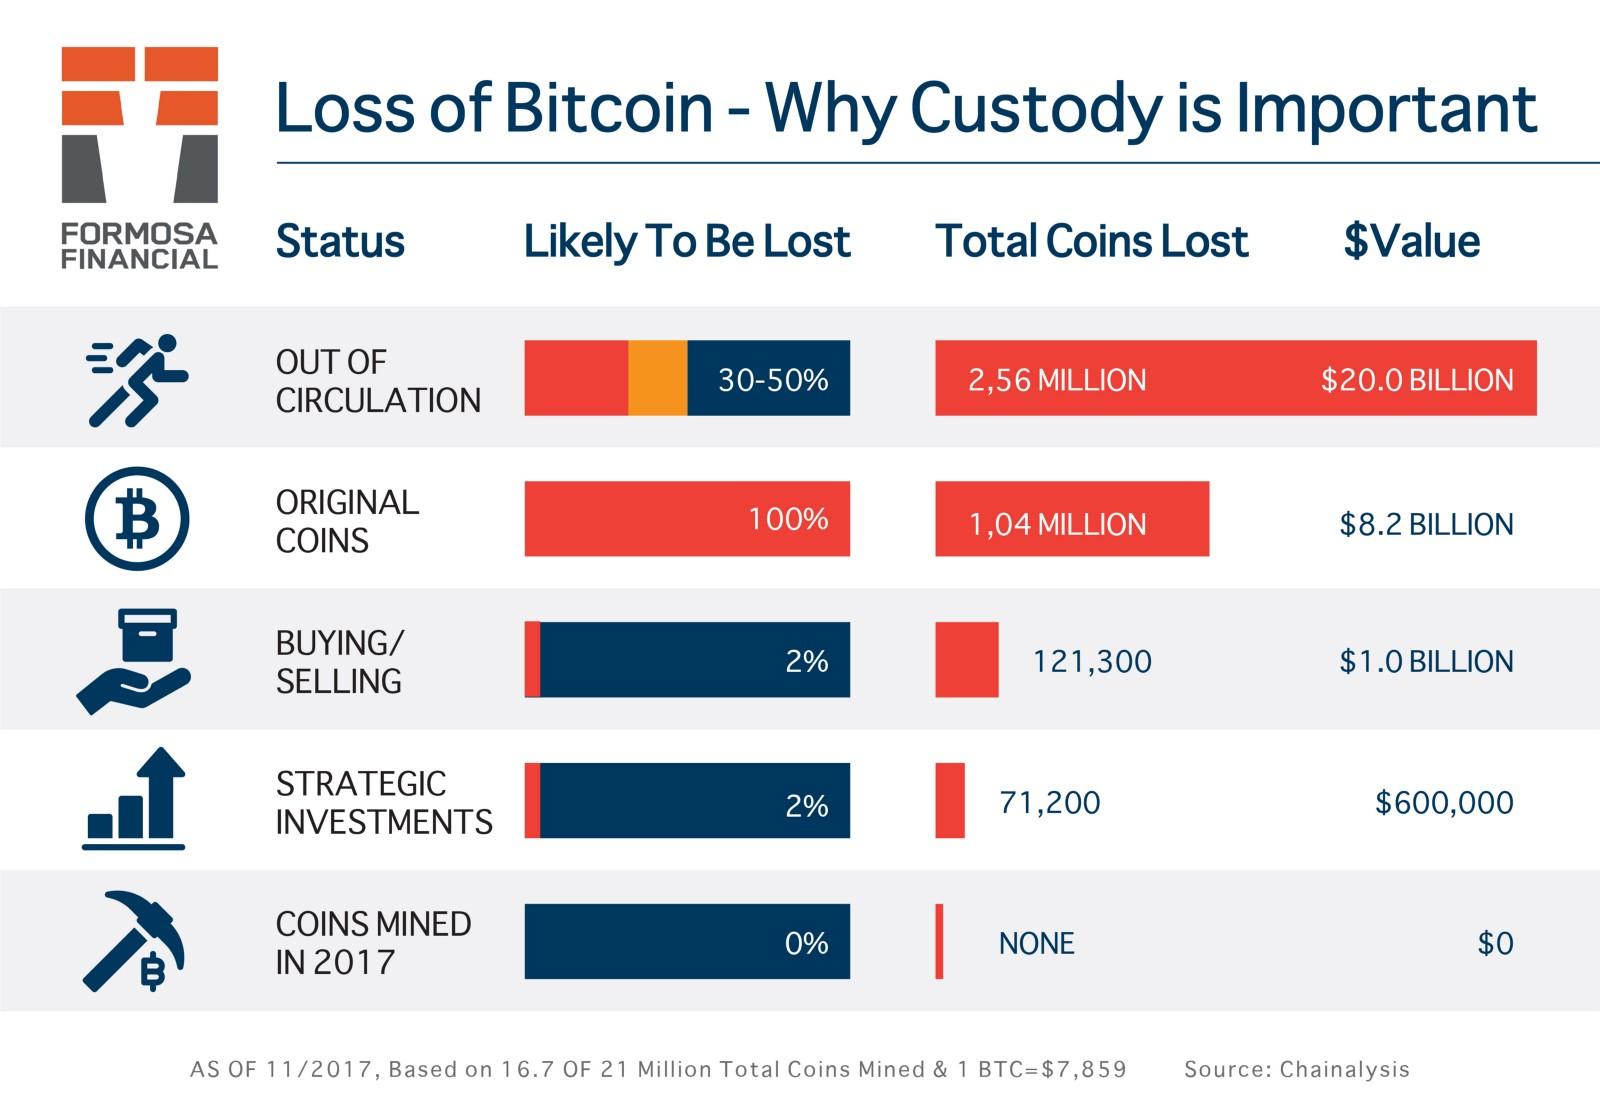 Importance of Digital Asset Custody - By